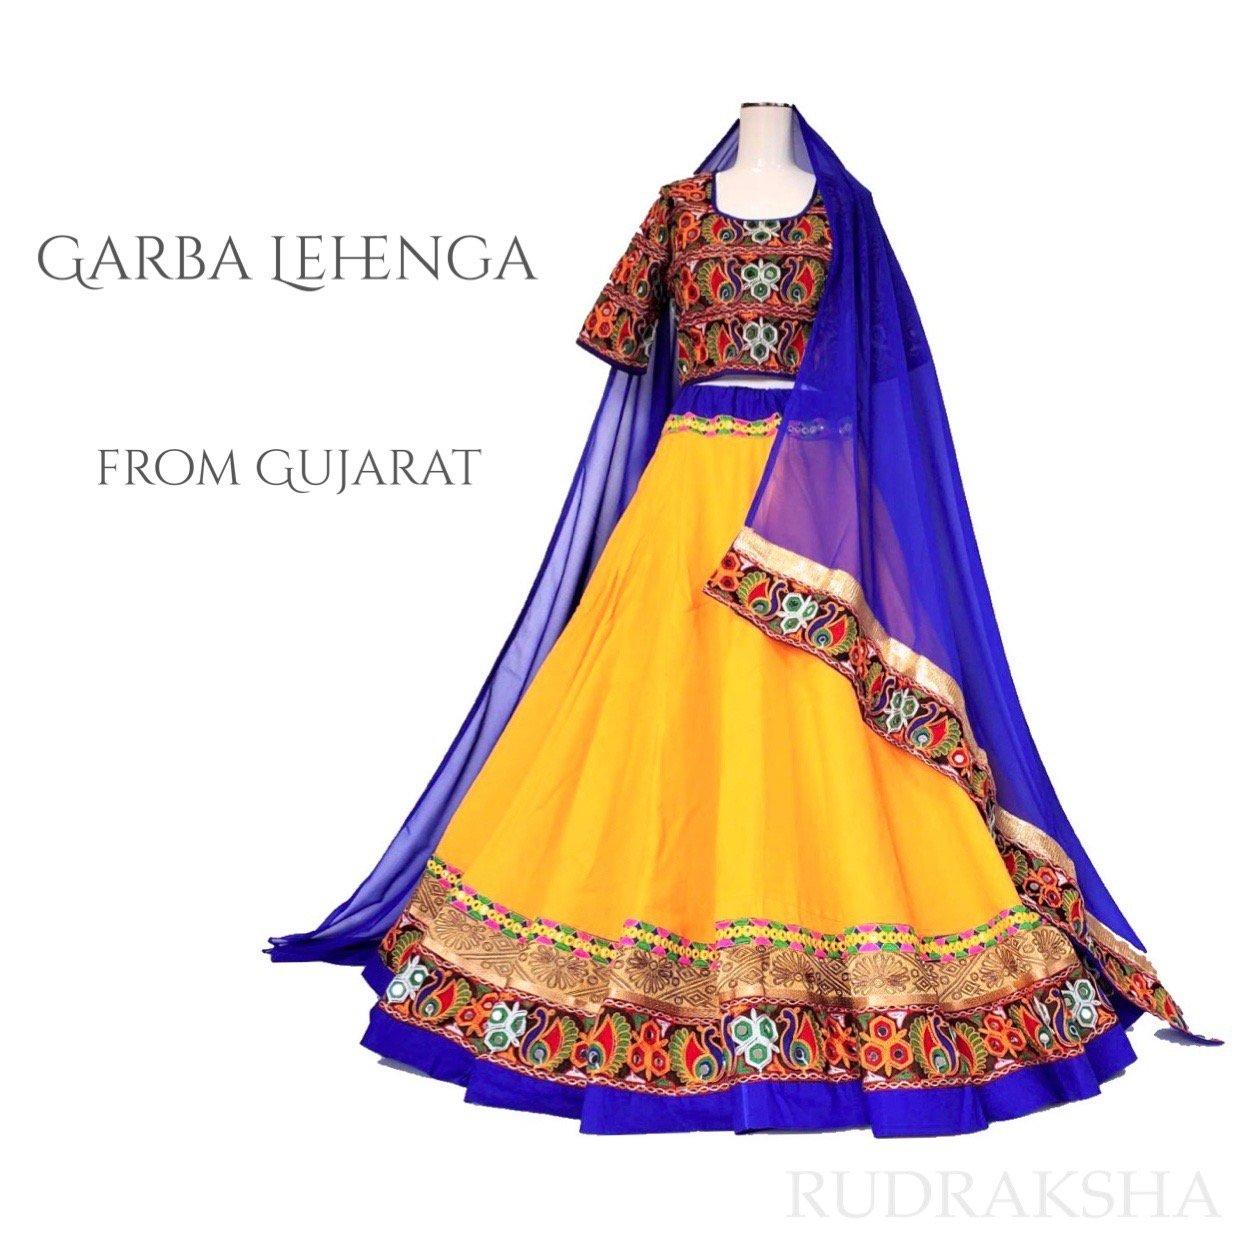 Rajasthani Lehenga <ロイヤルブルーxイエロー> ◇◆ インド 民族衣装 ラジャスタン レヘンガ